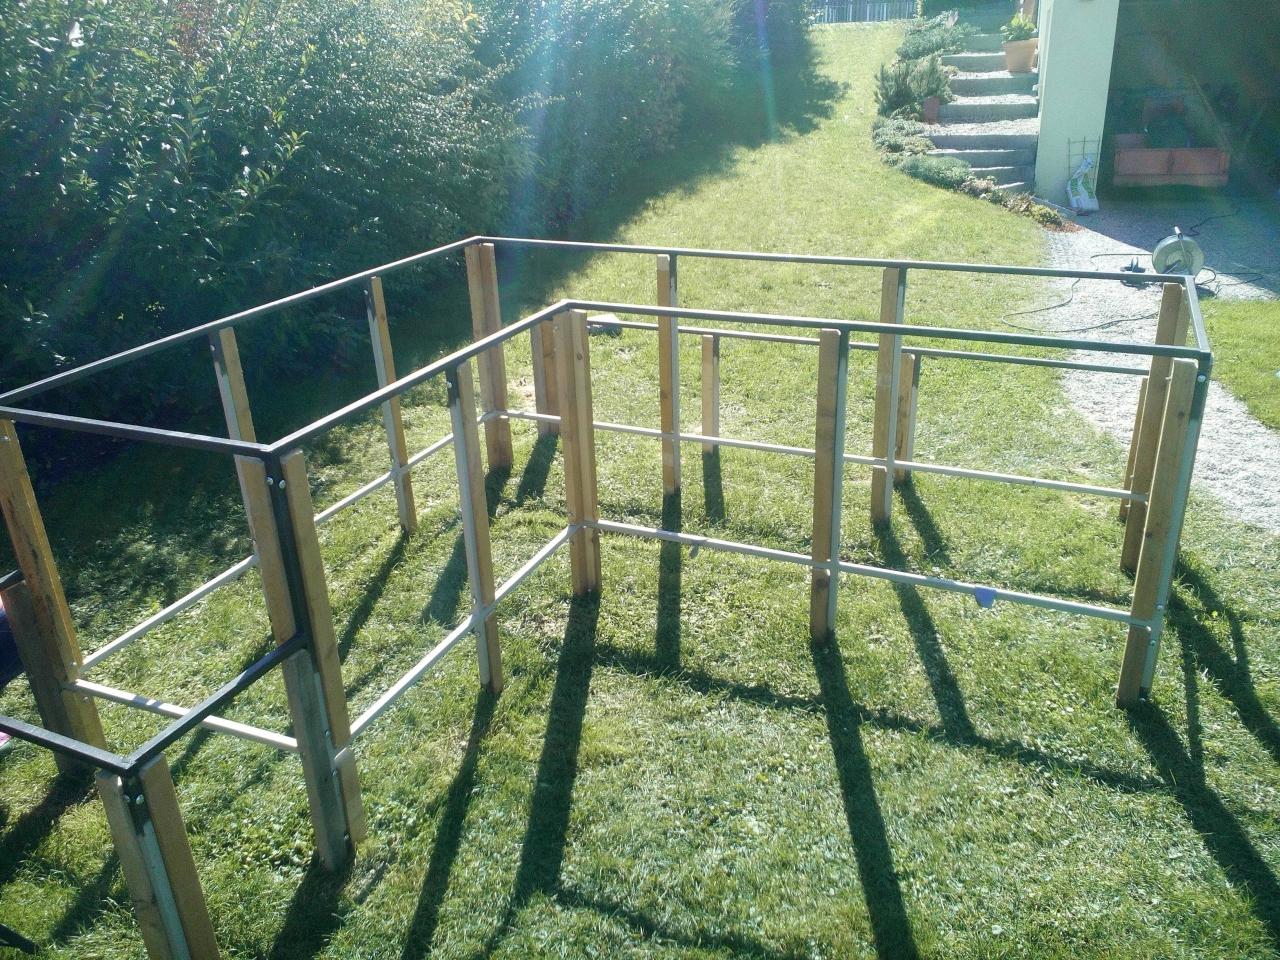 Hochbeet Eigenbau Bauanleitung Zum Selberbauen 1 2 Do Com